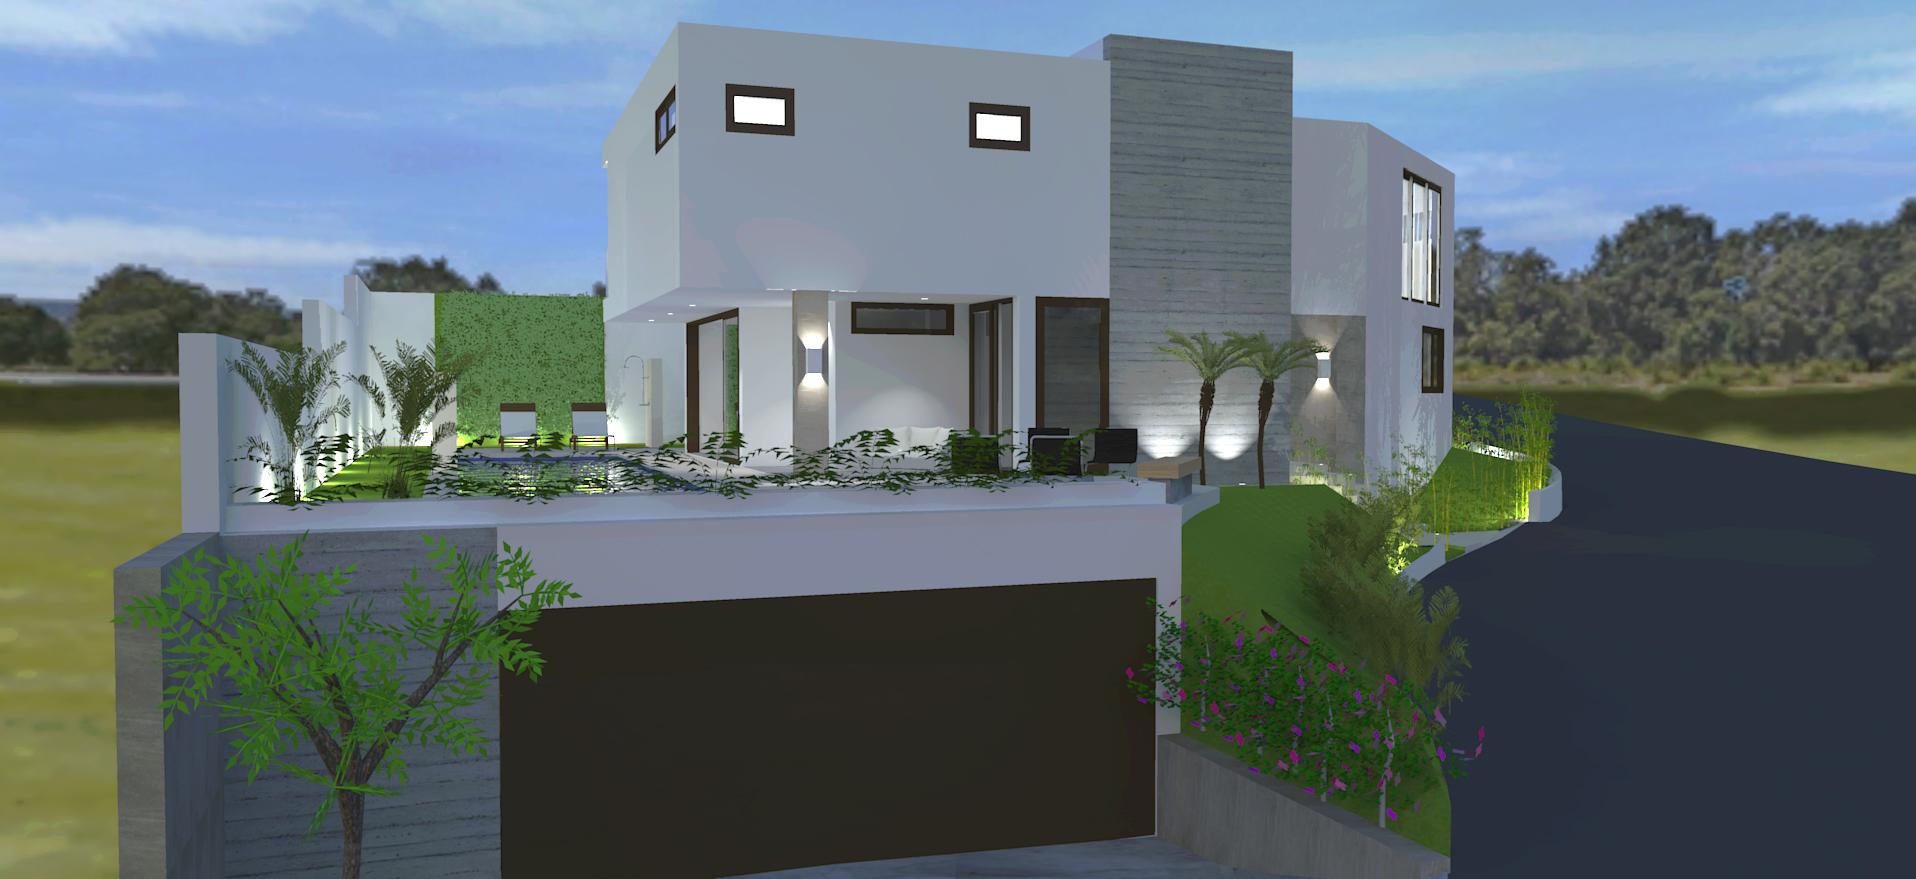 midrie-arquitetura-Residencia1_v2.jpg